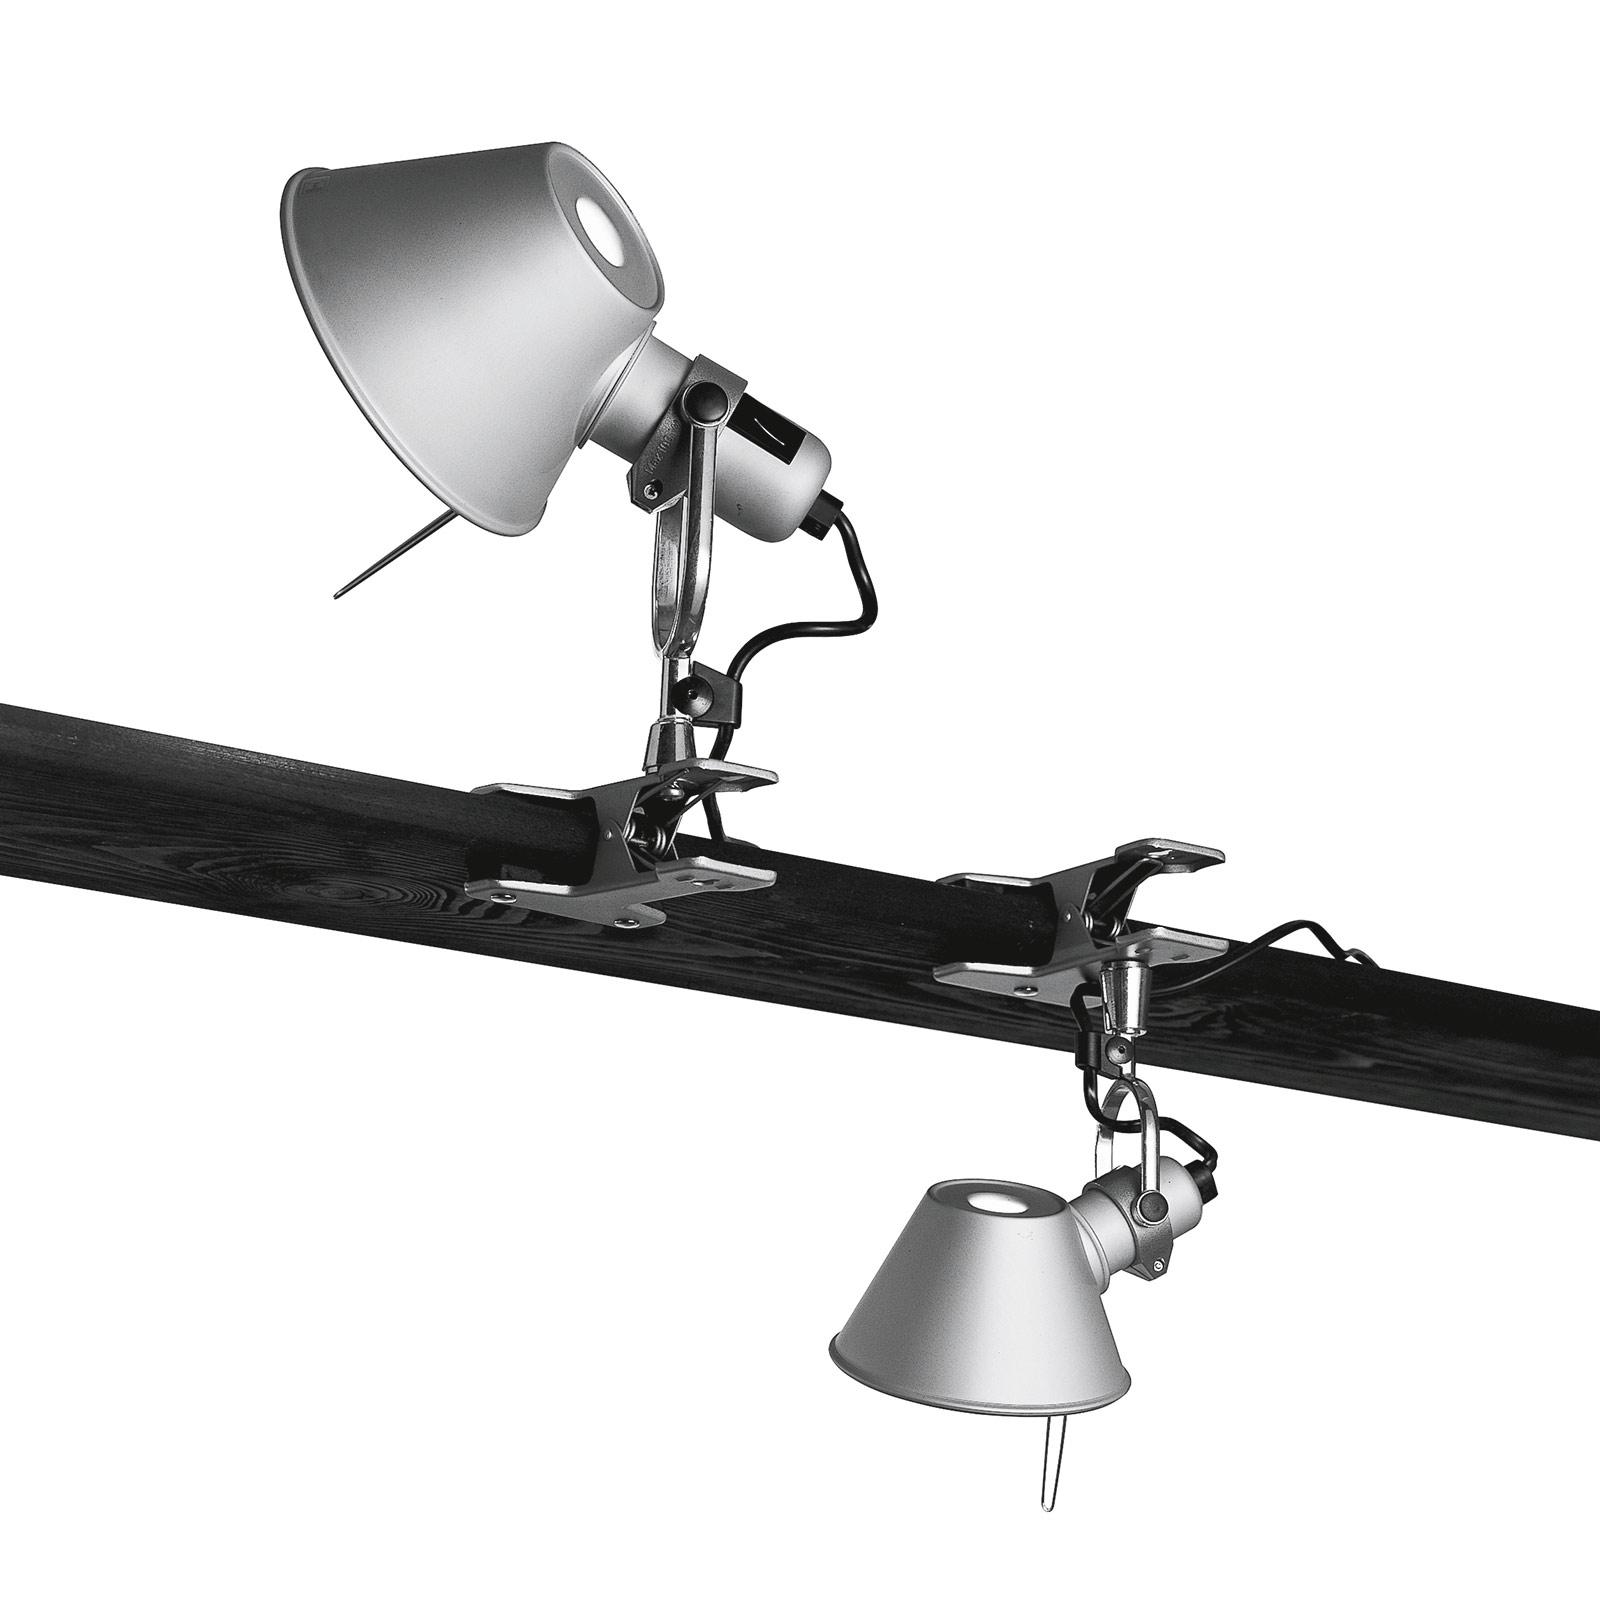 Artemide Tolomeo Pinza lampe à pince LED 2700K